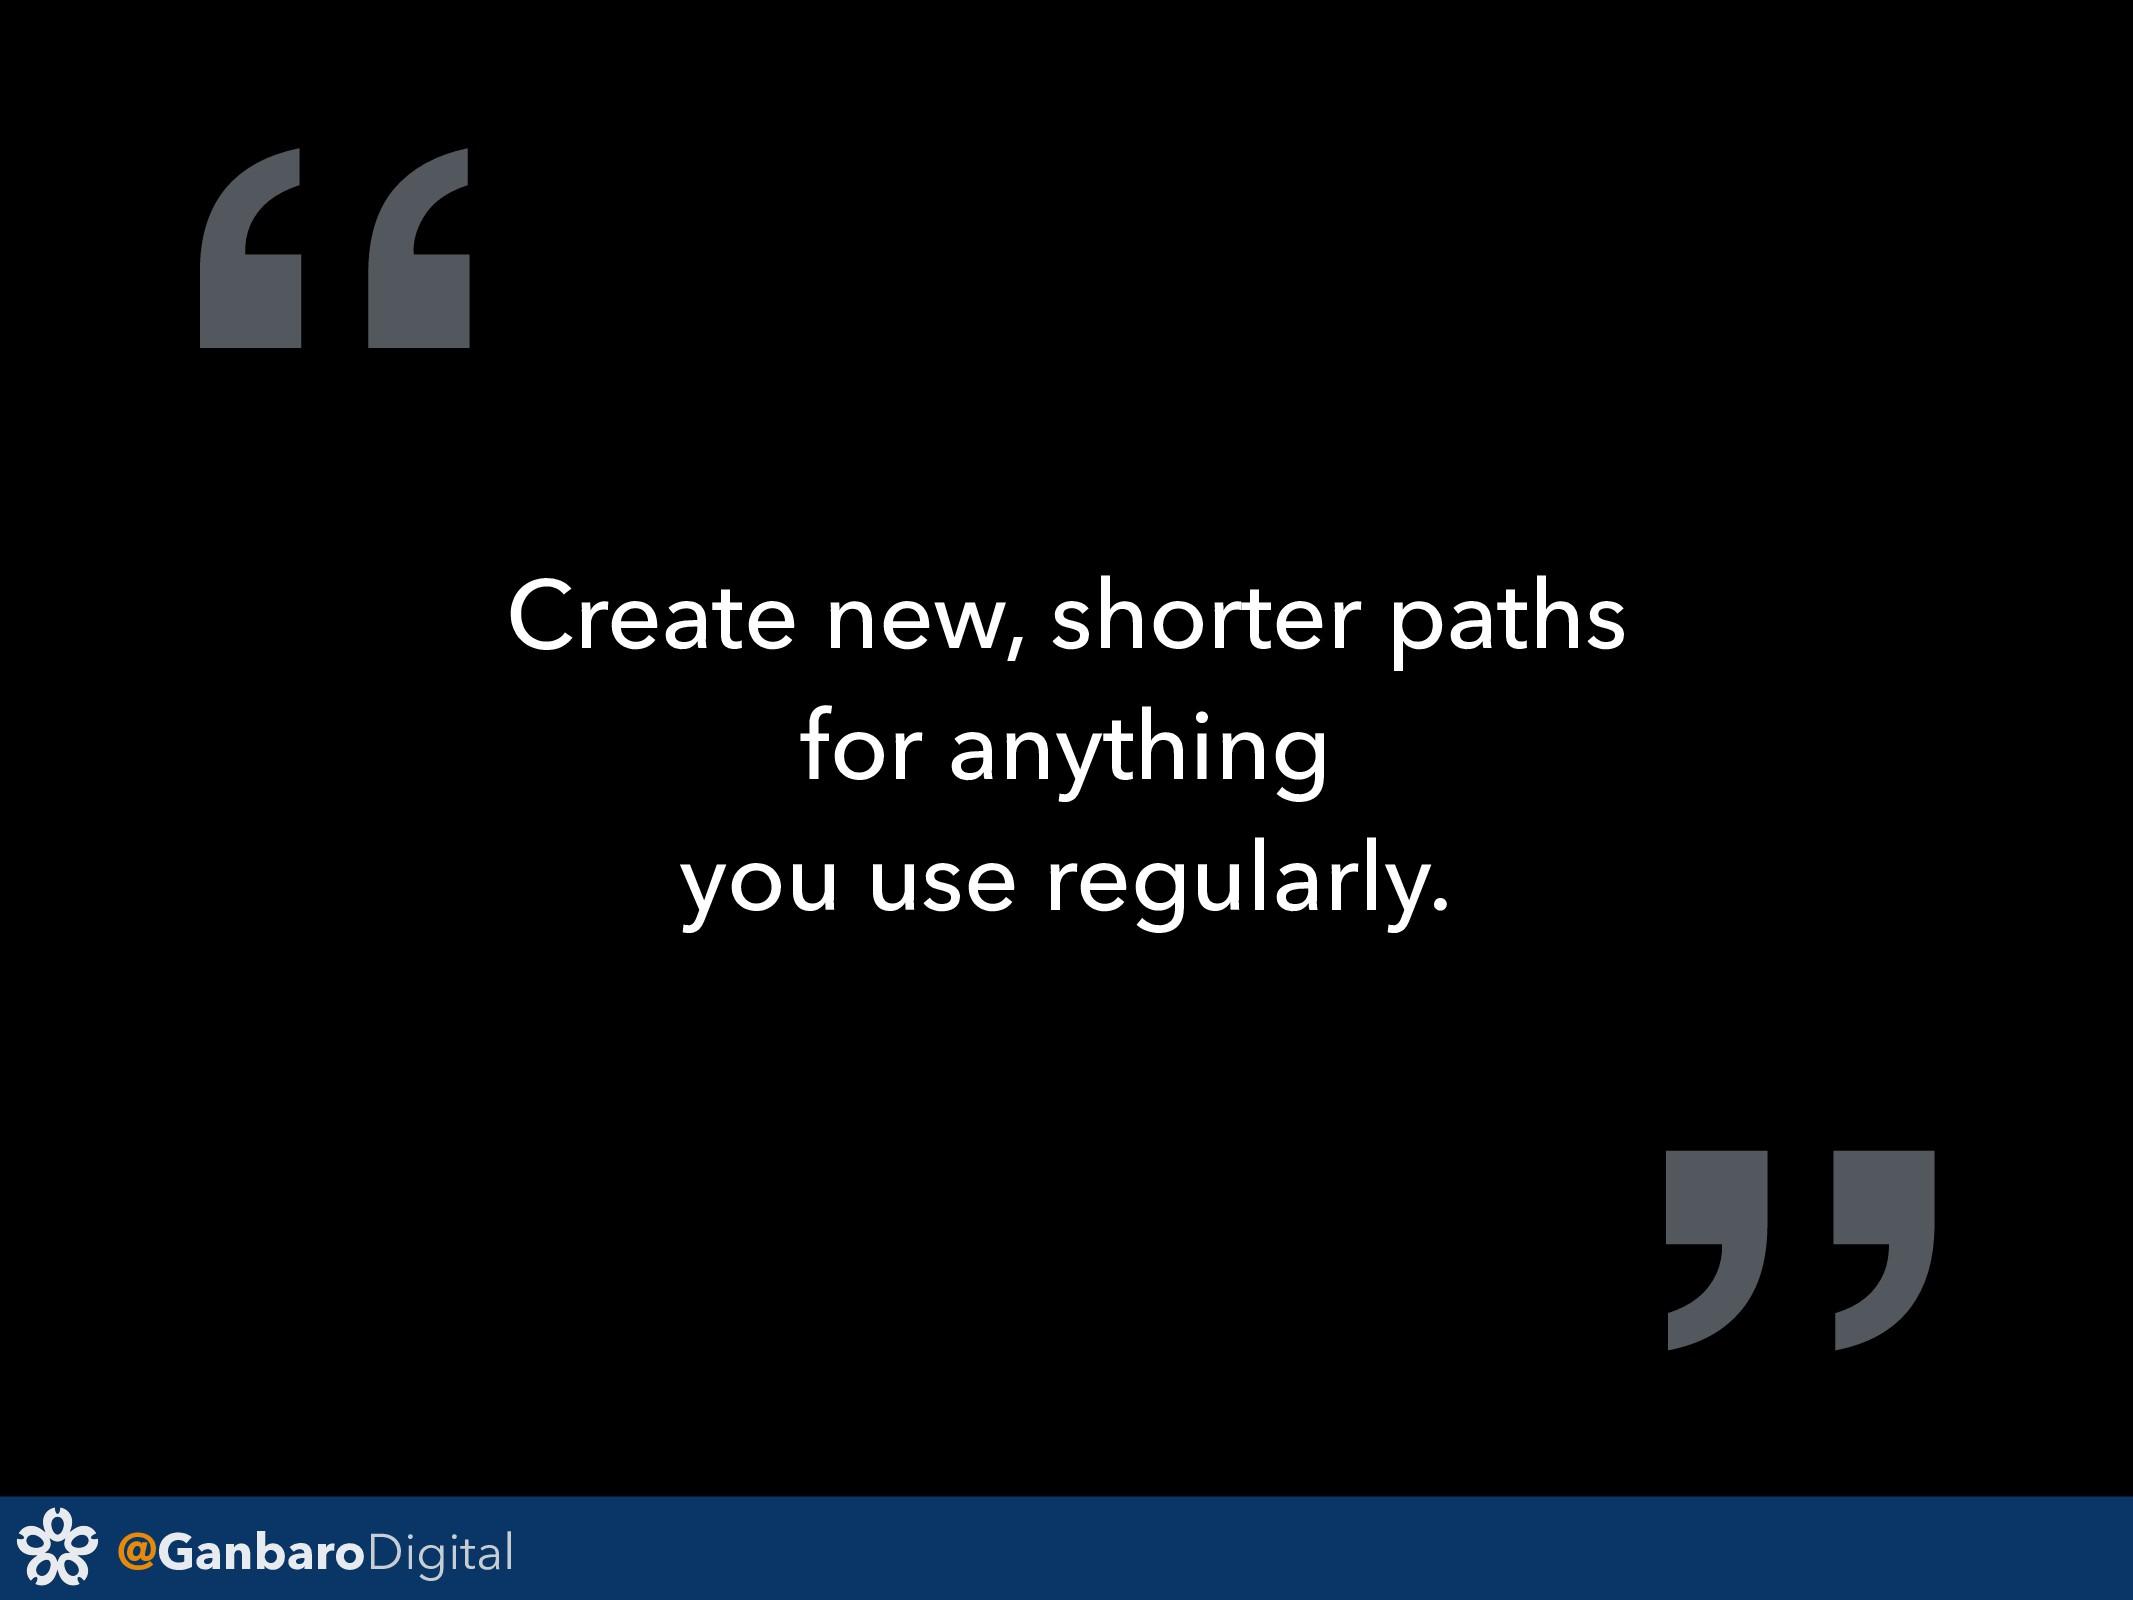 "@GanbaroDigital "" Create new, shorter paths for..."